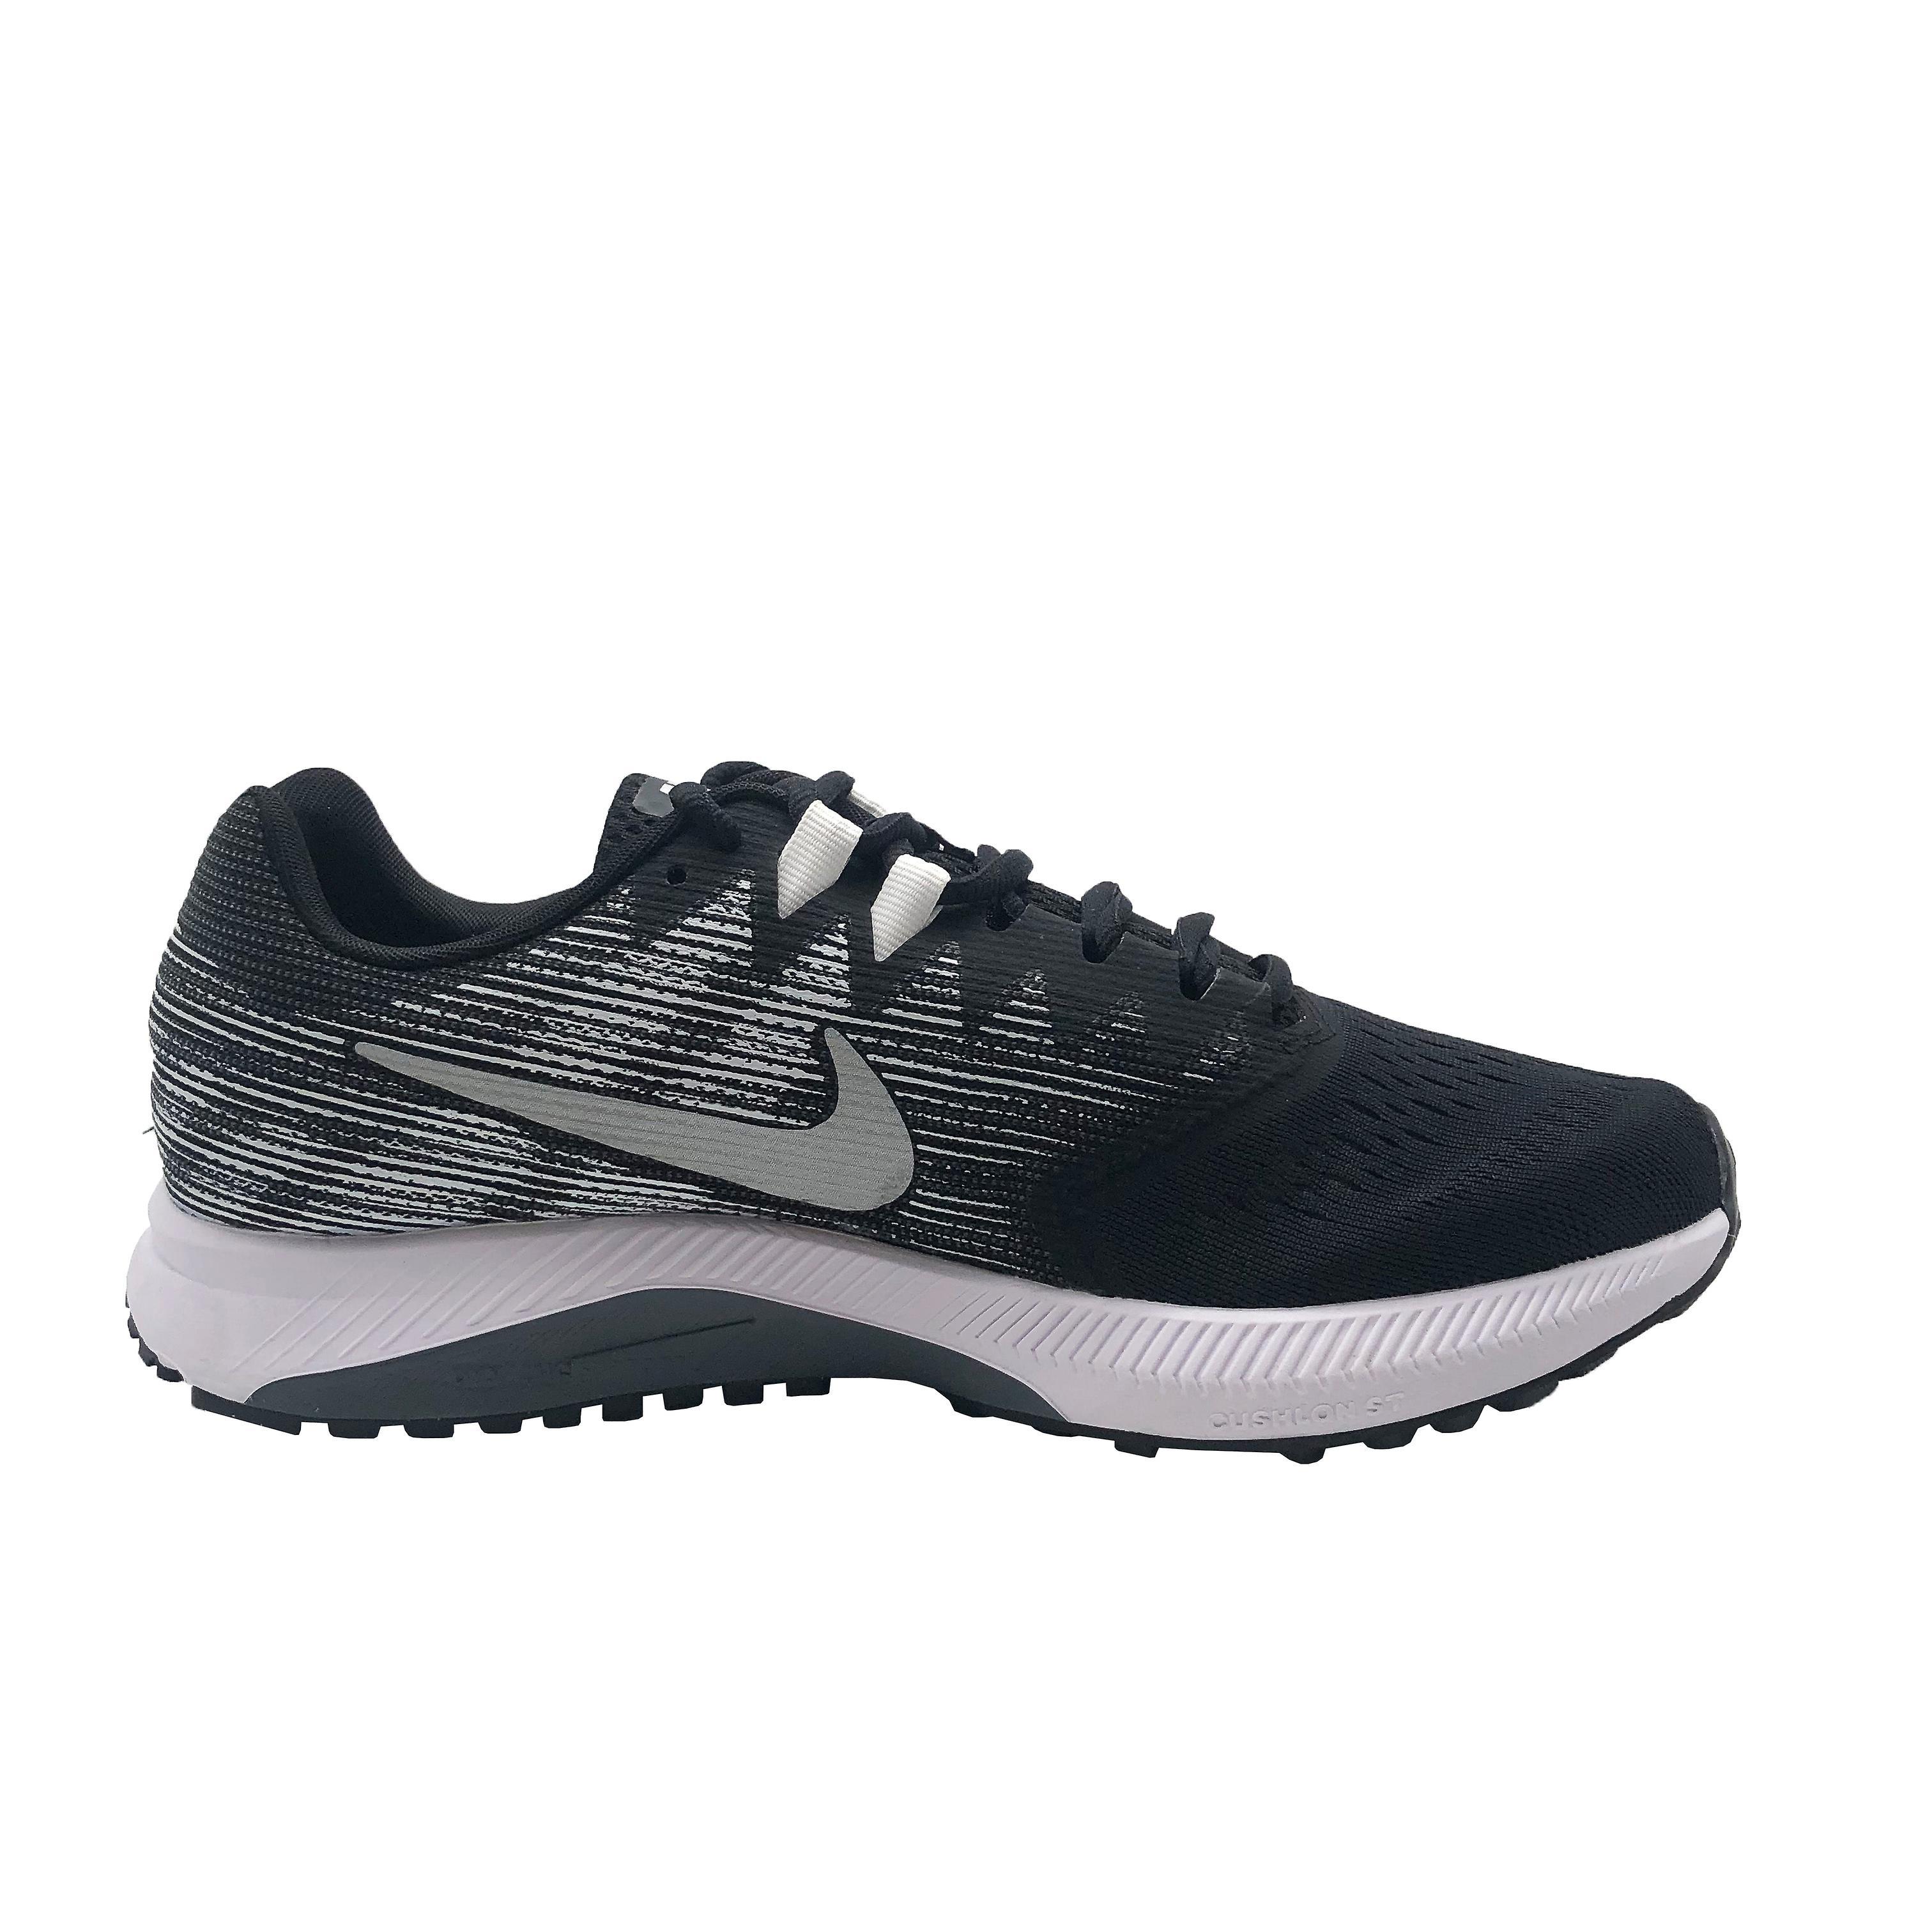 Nike Zoom span 2 908990 001 Mens utbildare